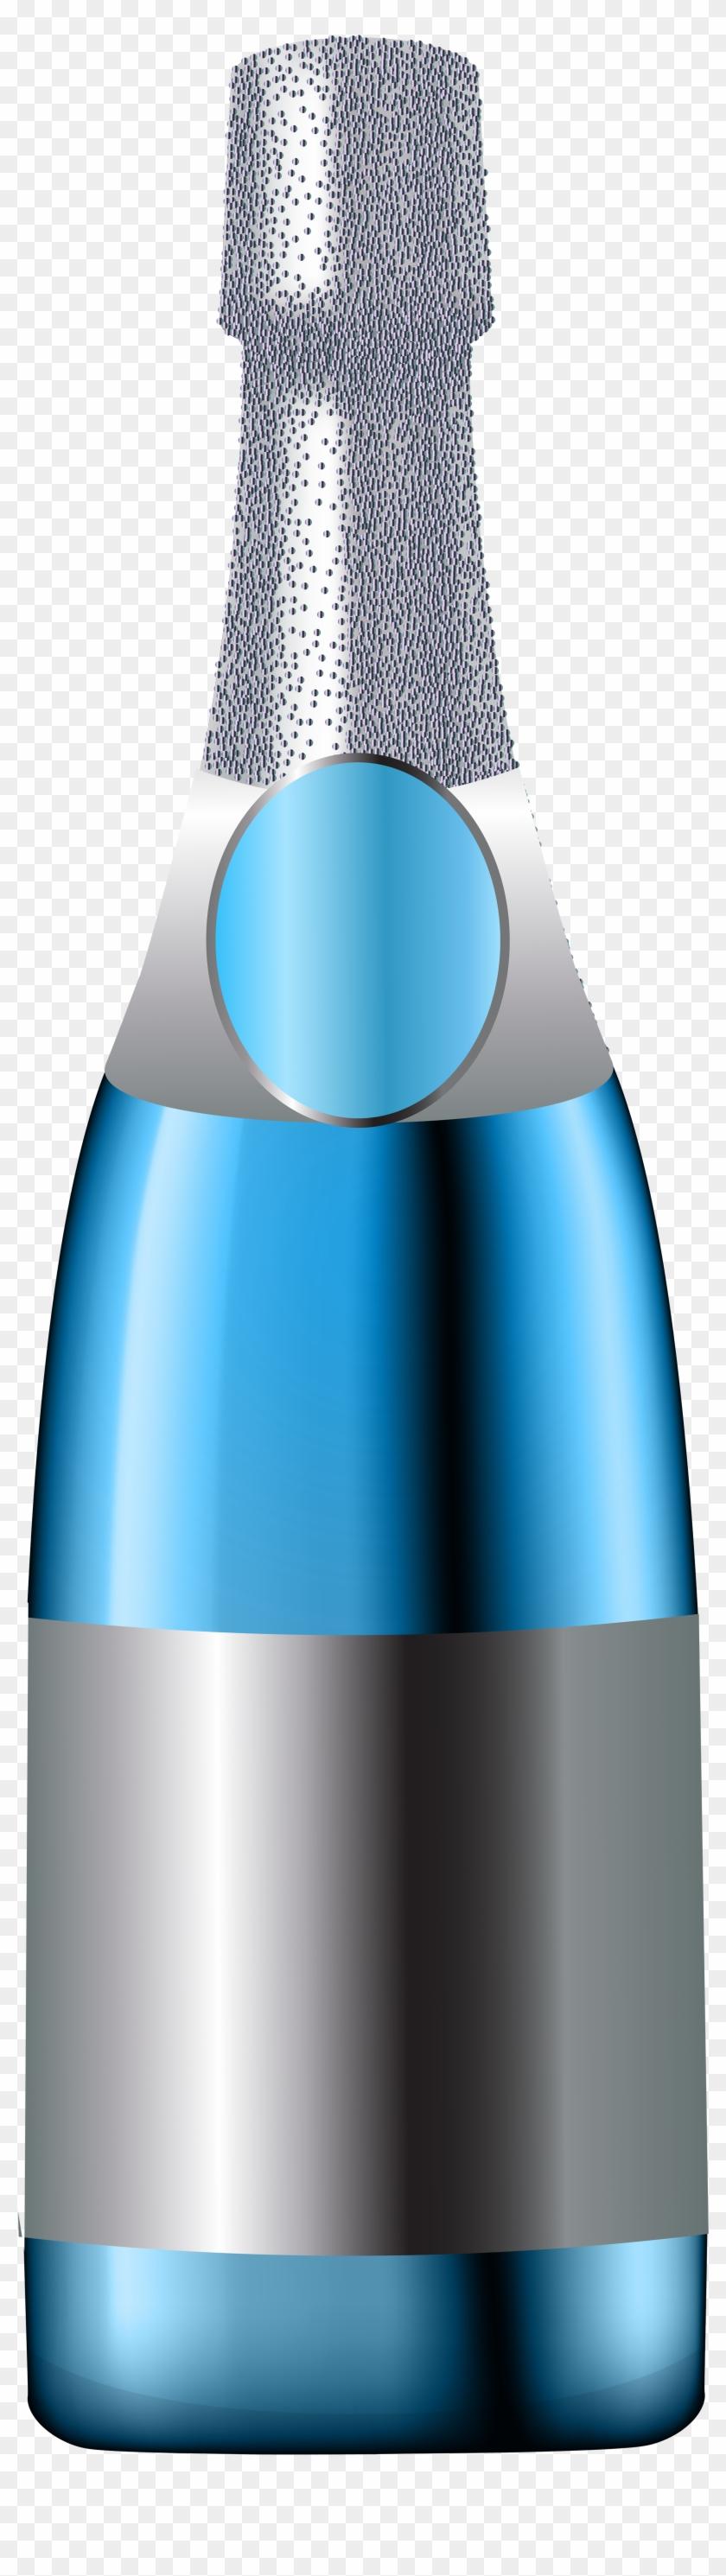 Free Transparent Champagne Bottle Clipart #444639